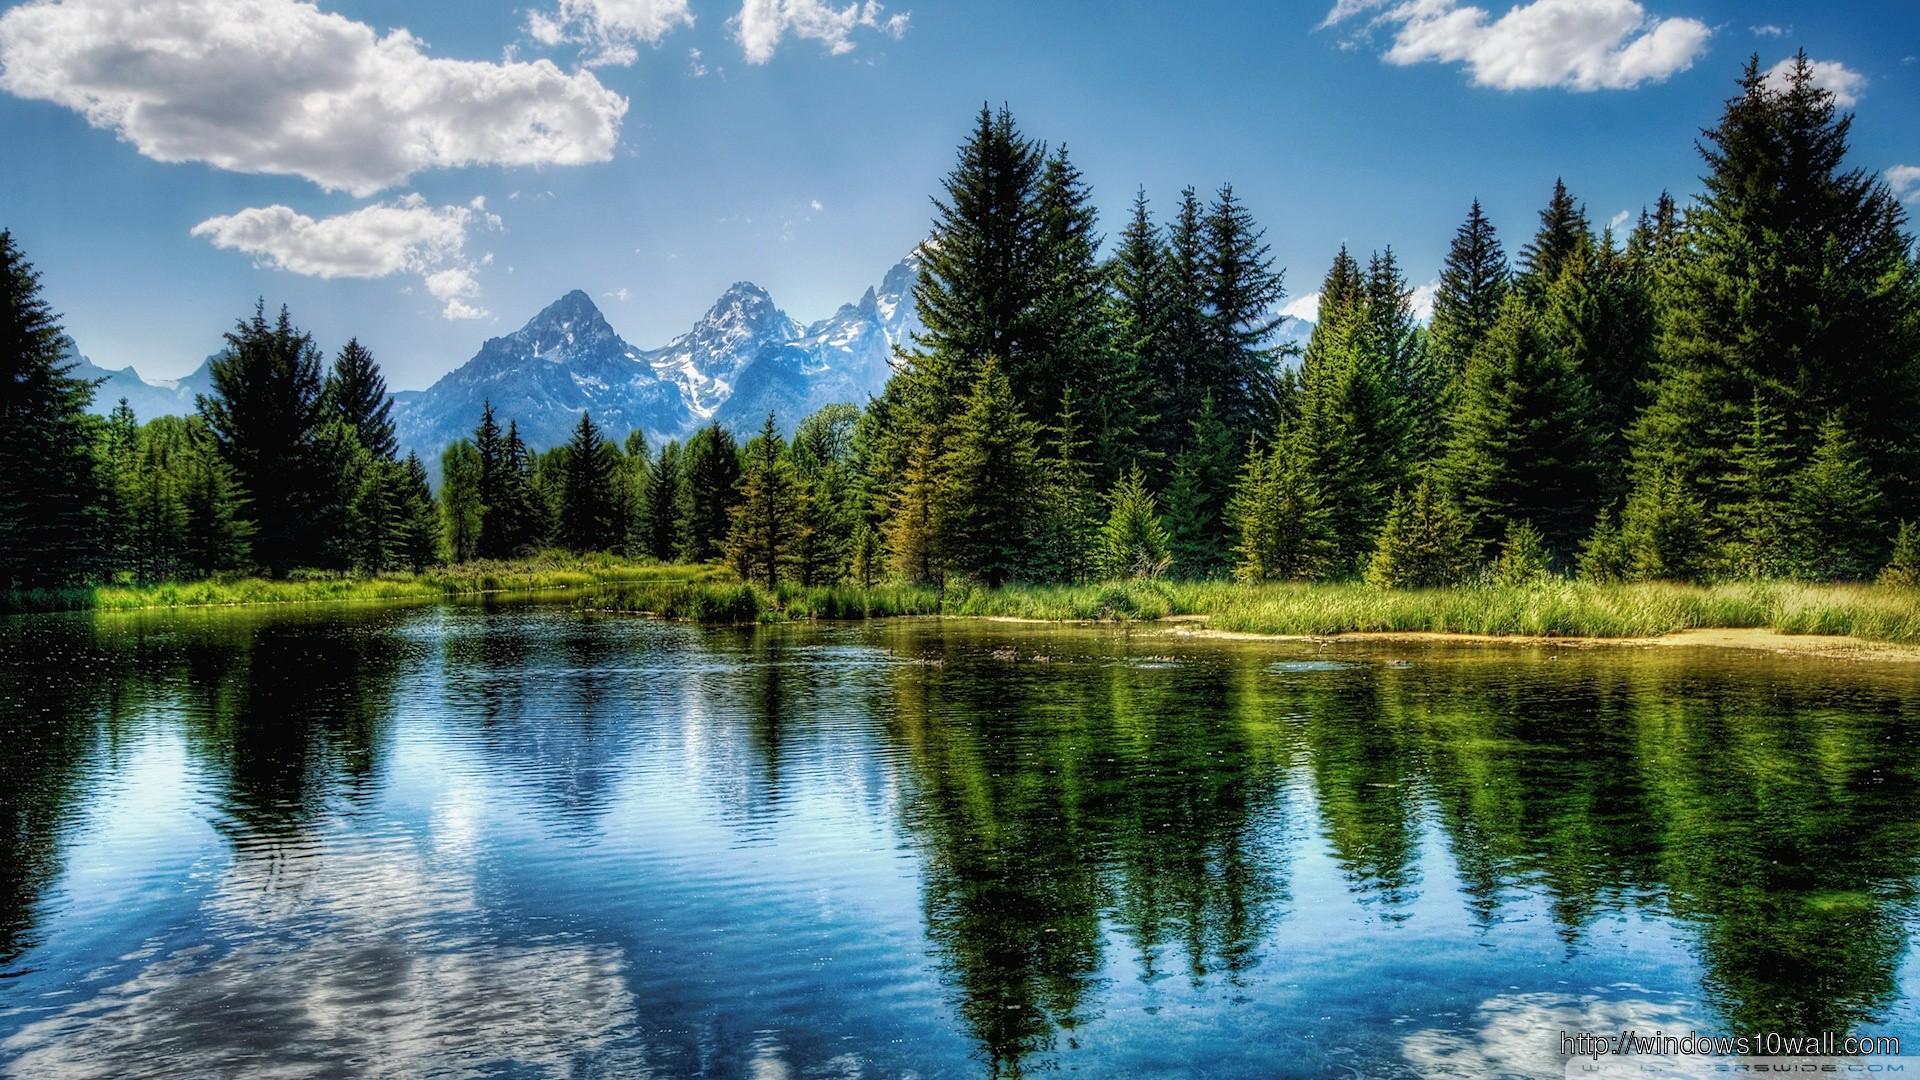 Fantastic Wallpaper Mountain Windows 10 - mountains-nature-river-wallpaper  Snapshot_597691.jpg